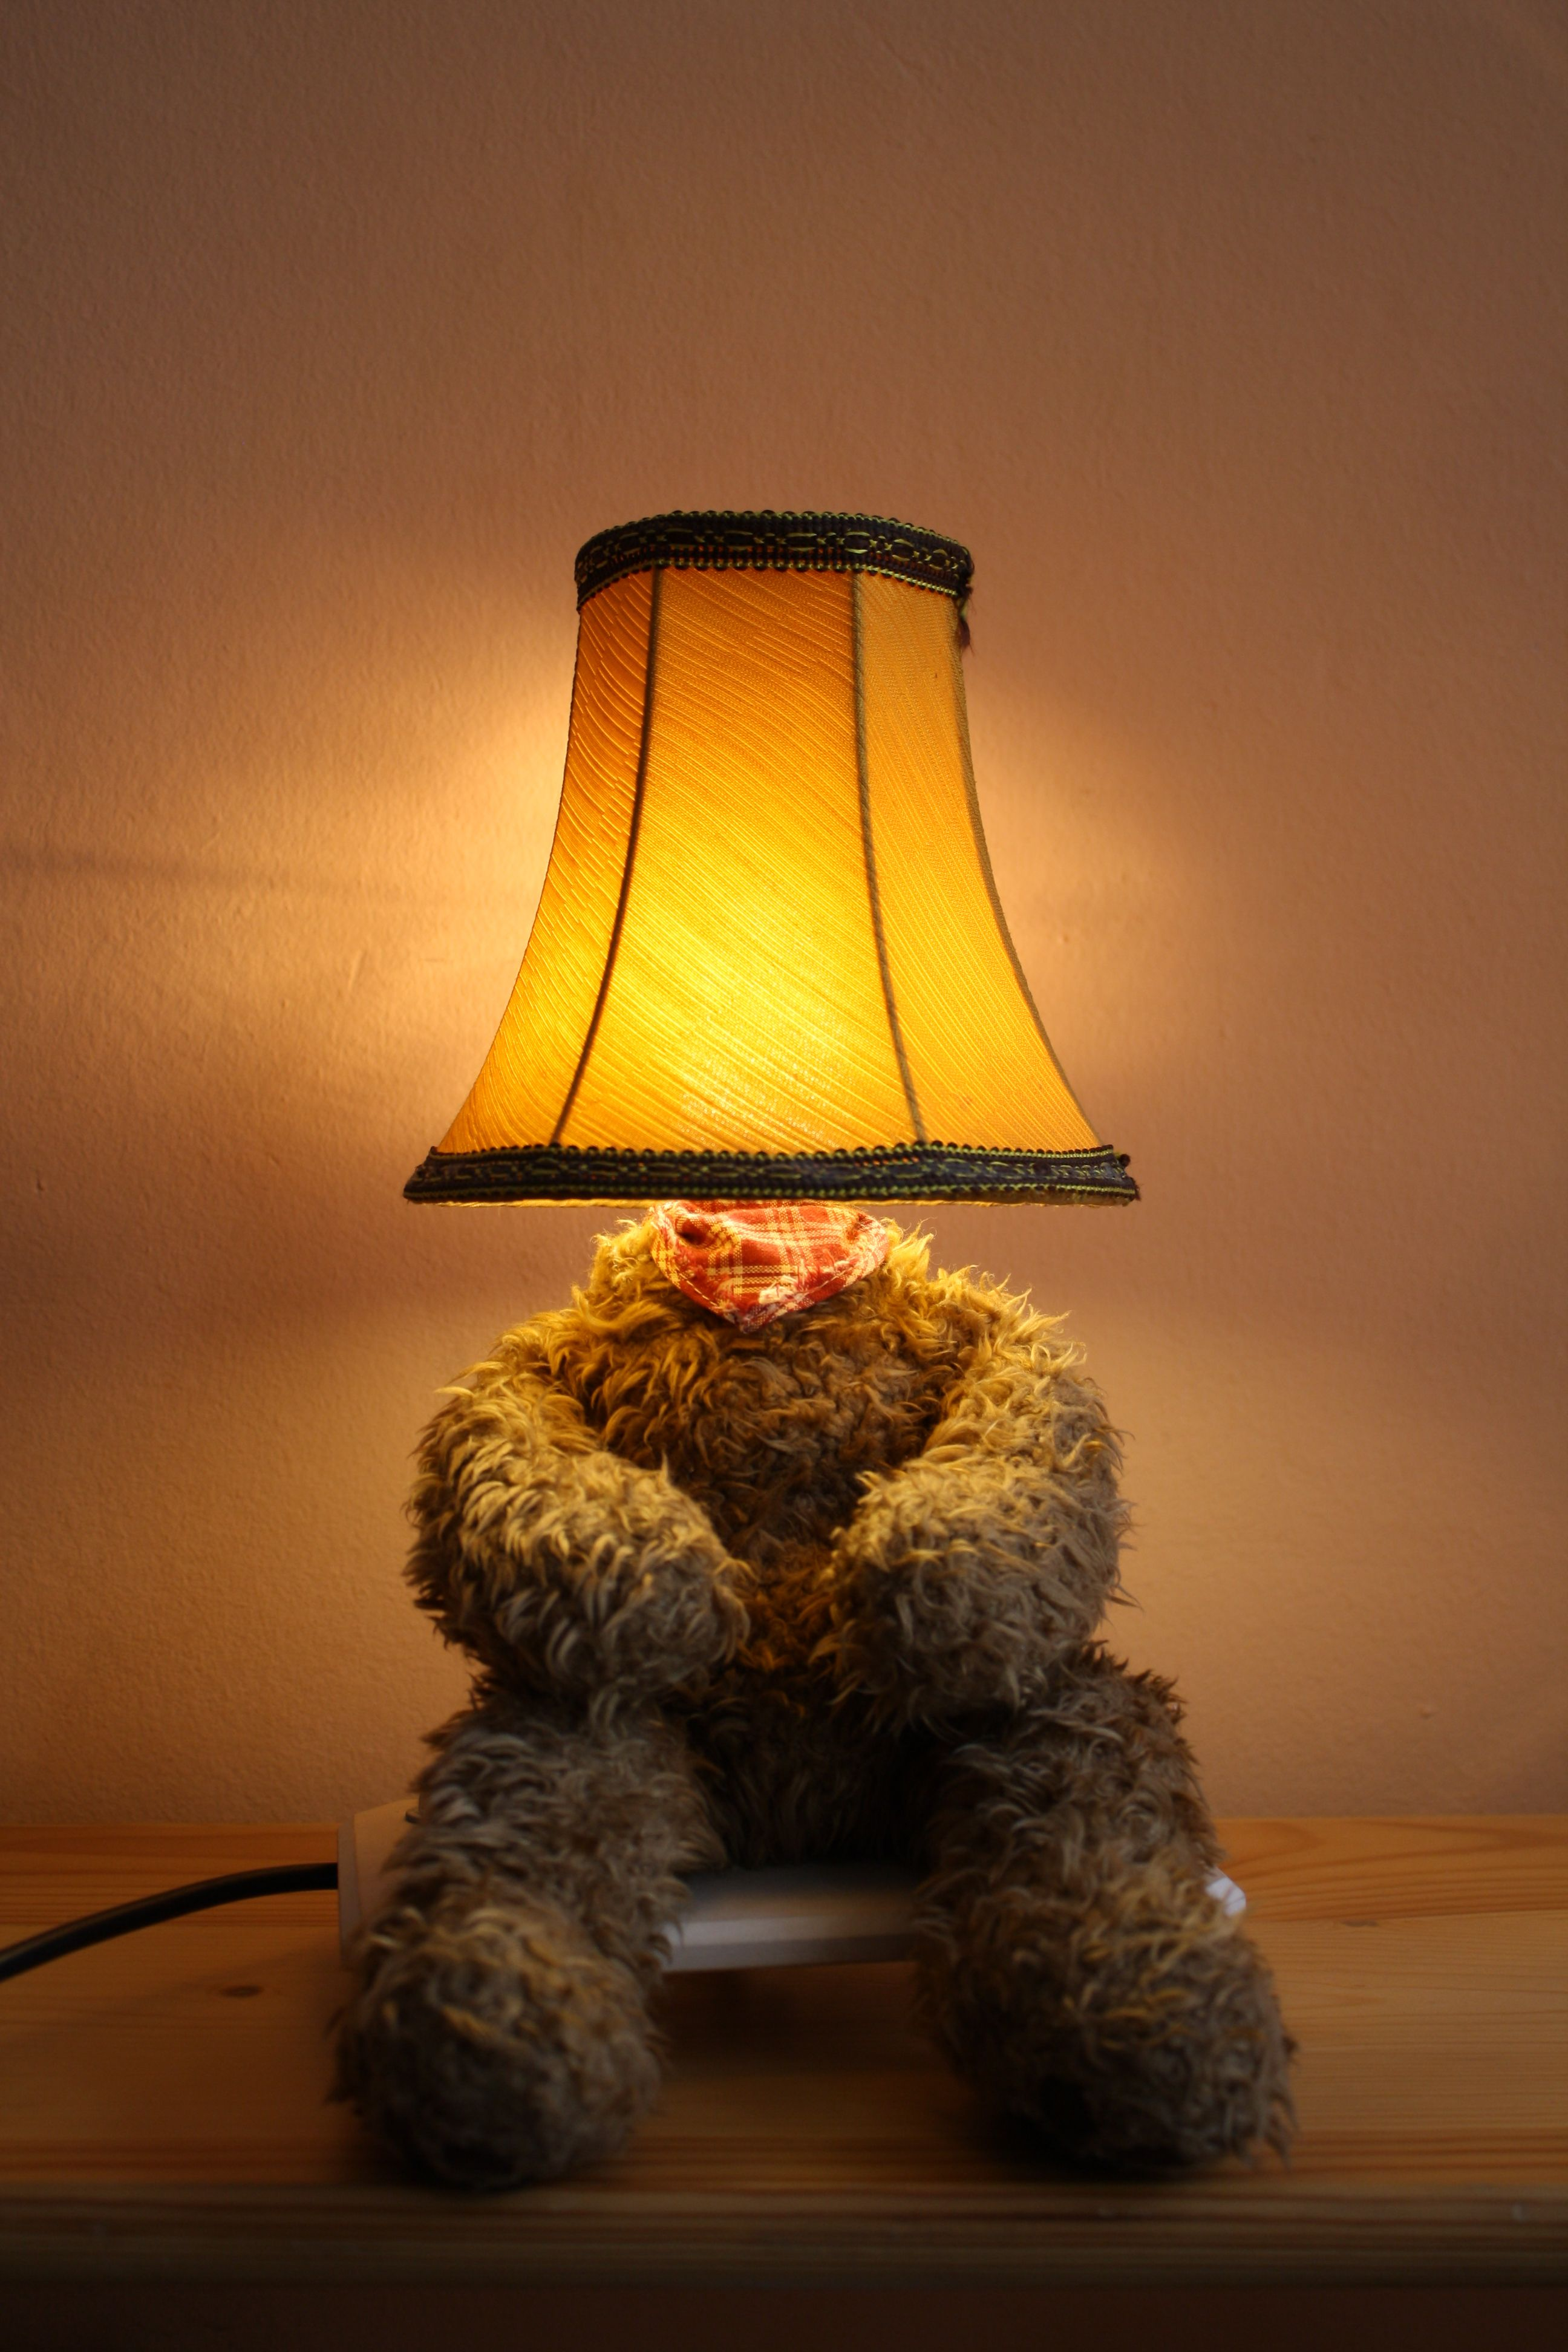 Lamp Bear Old Teddy Bear Old Lamp Shade Mood Lighting Led